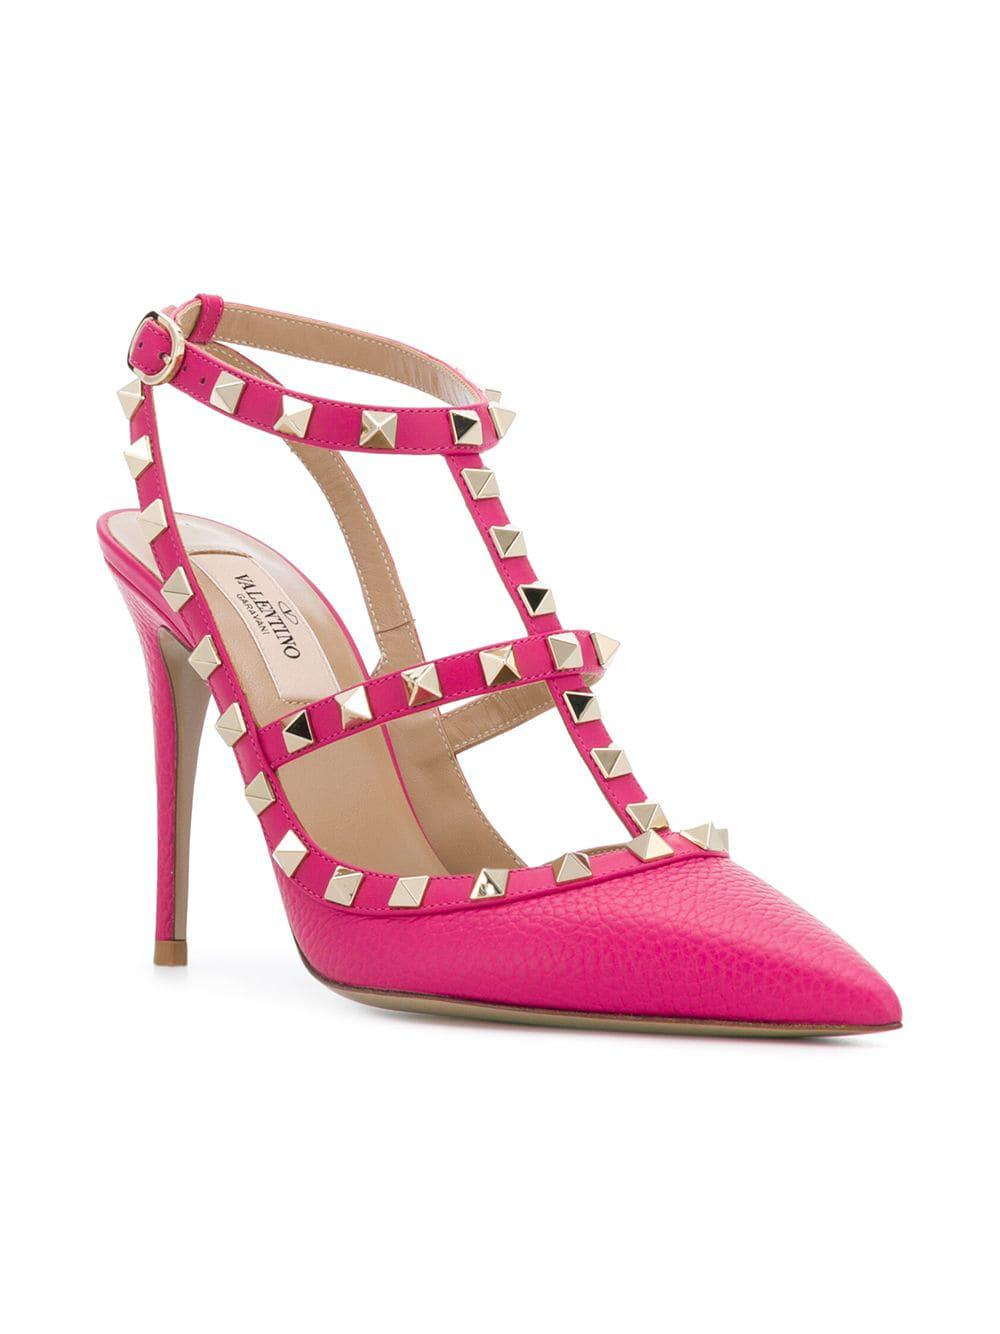 833aeef5af69 Valentino - Pink Garavani Rockstud Pumps - Lyst. View fullscreen